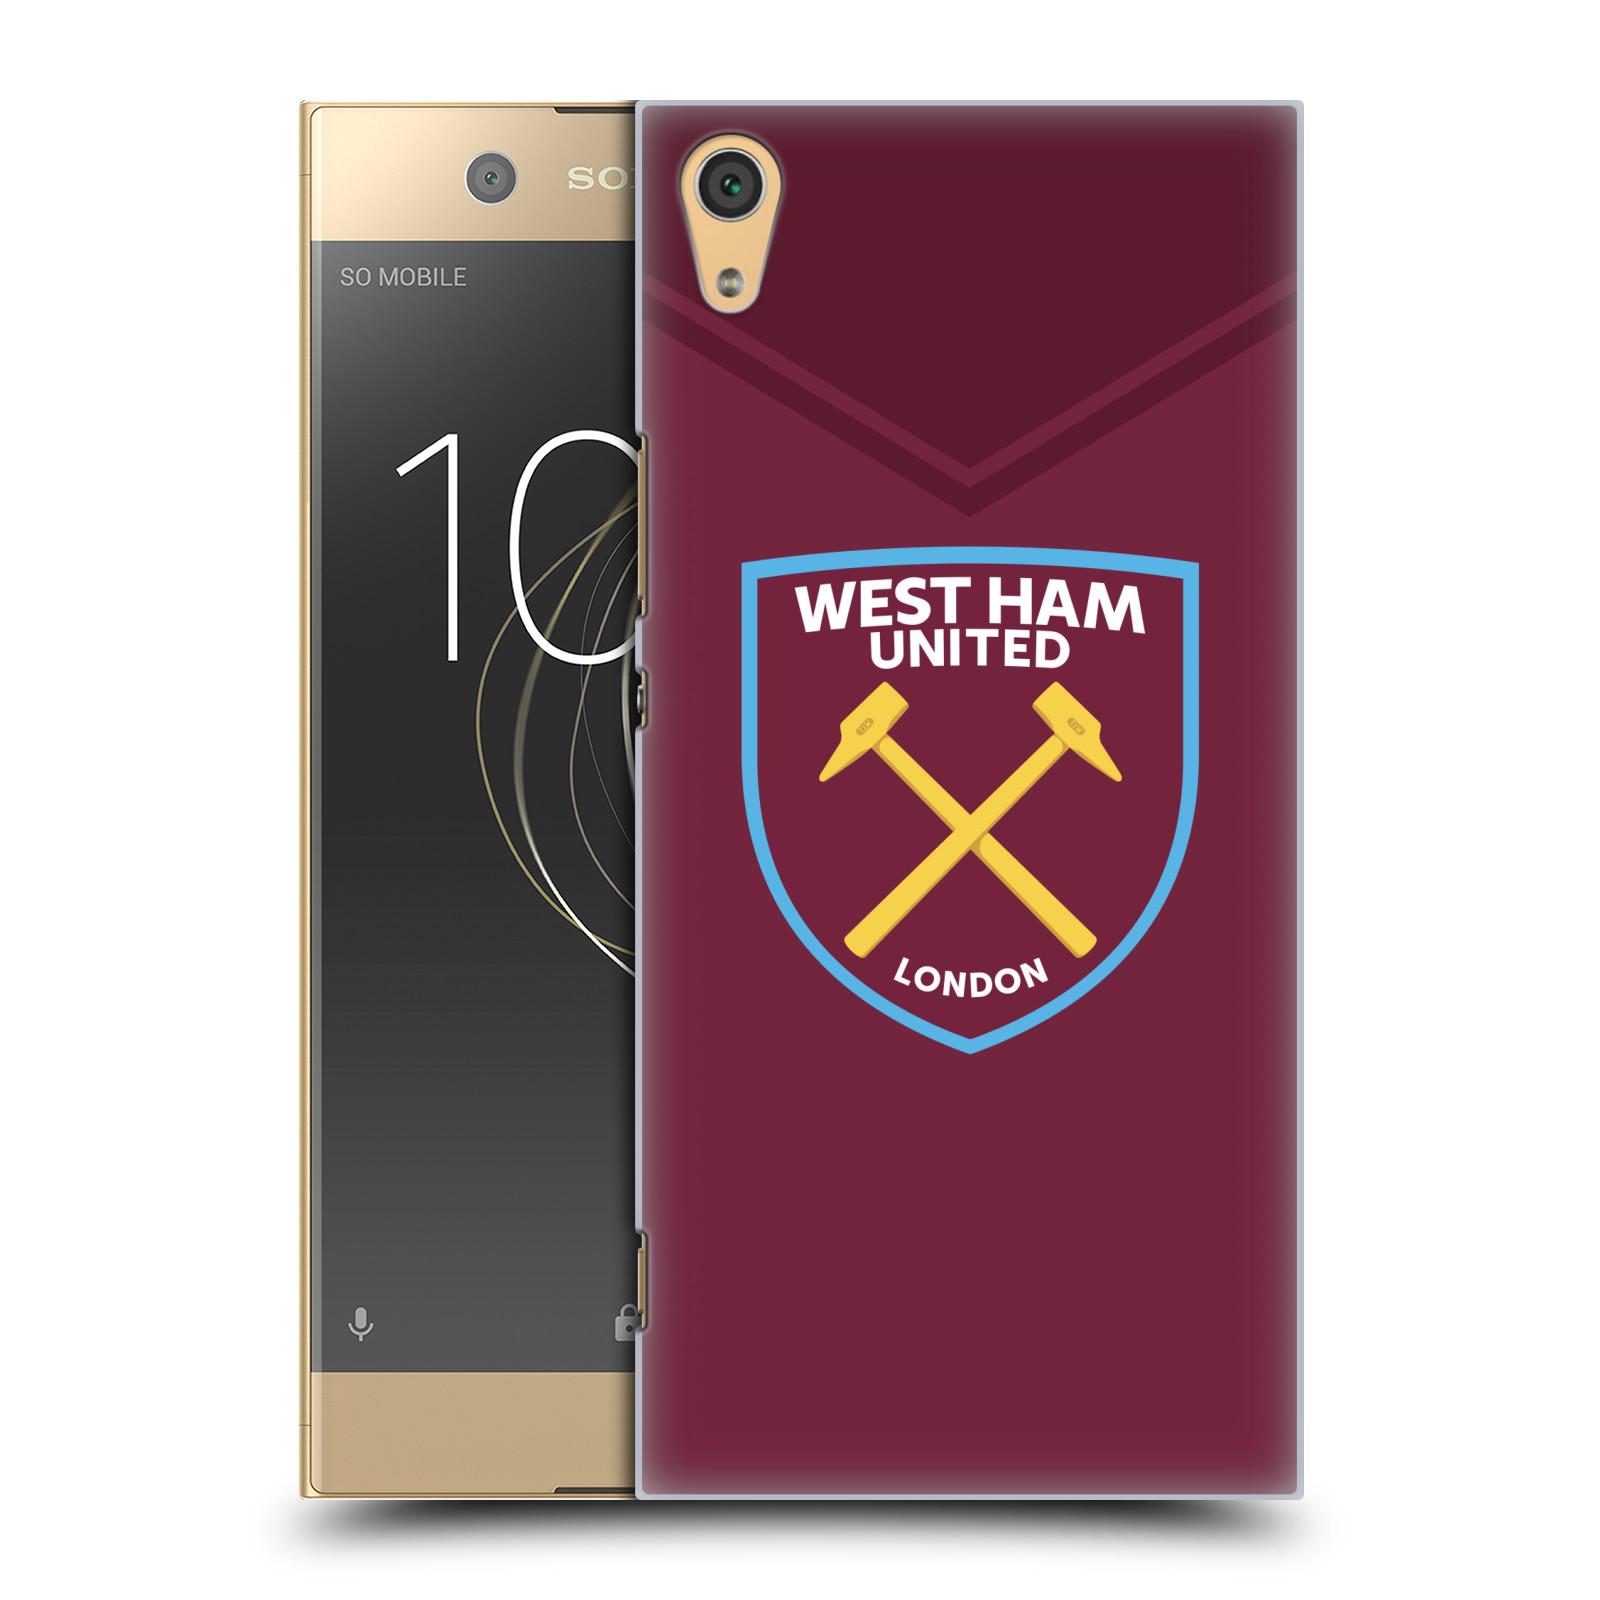 Plastové pouzdro na mobil Sony Xperia XA1 Ultra - Head Case - West Ham United - Logo